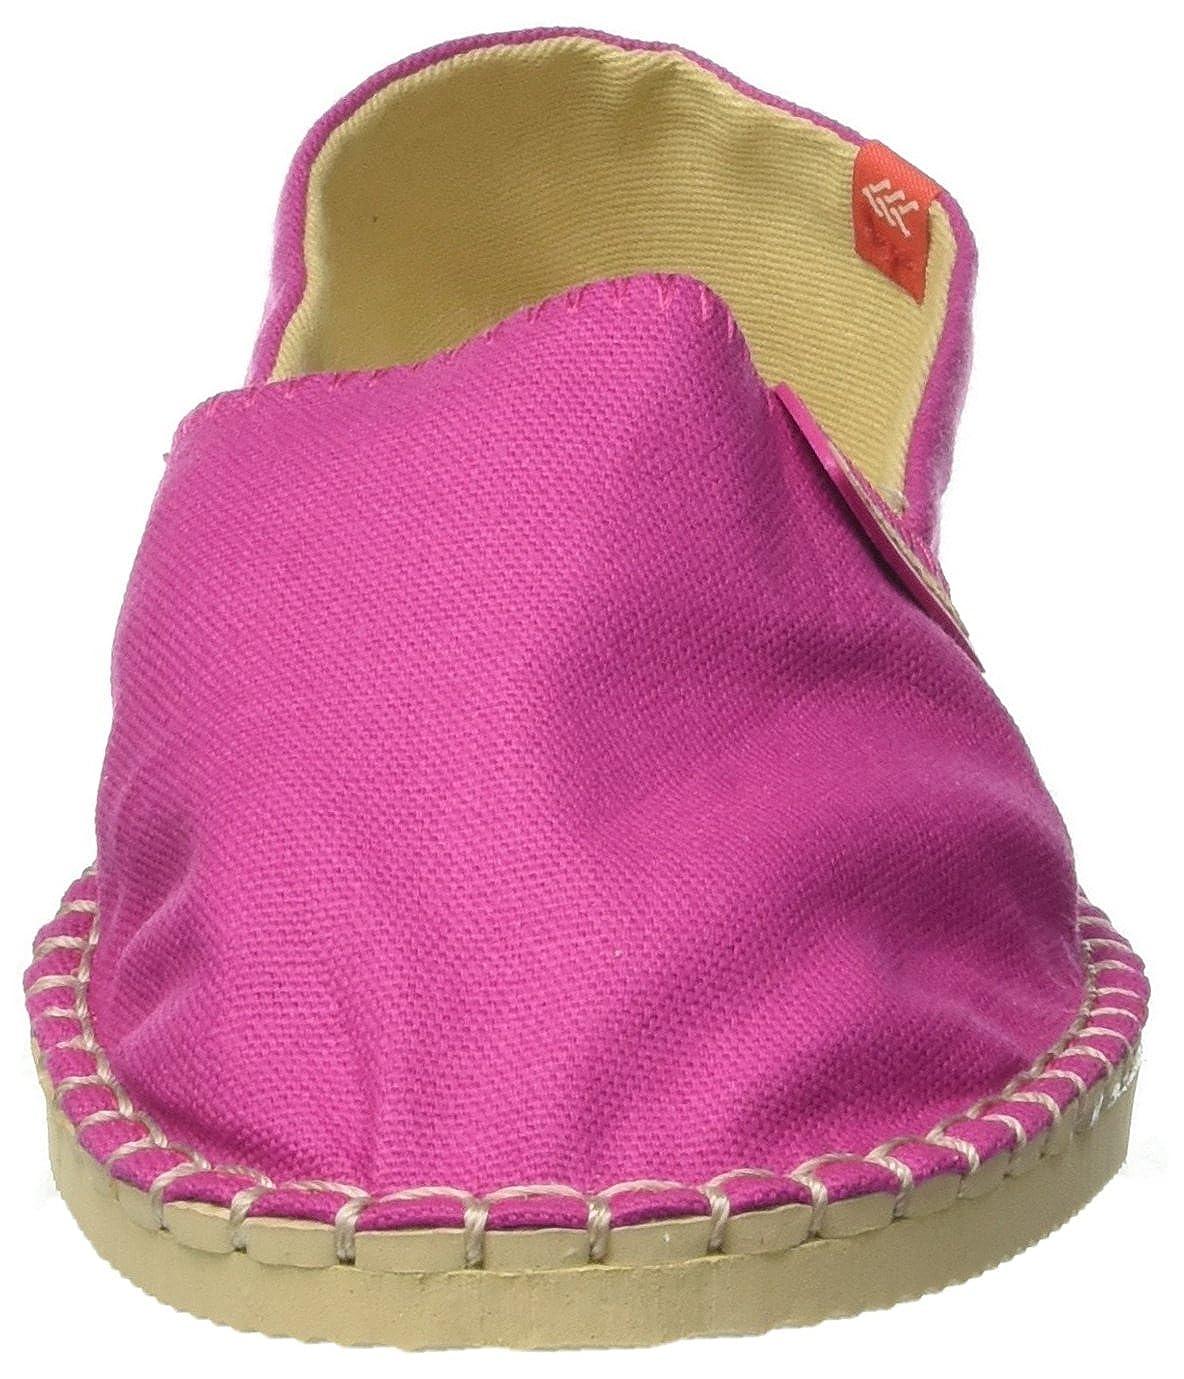 Havaianas Unisex-Erwachsene Origine III Espadrilles Pink 41 EU Raspberry Rose